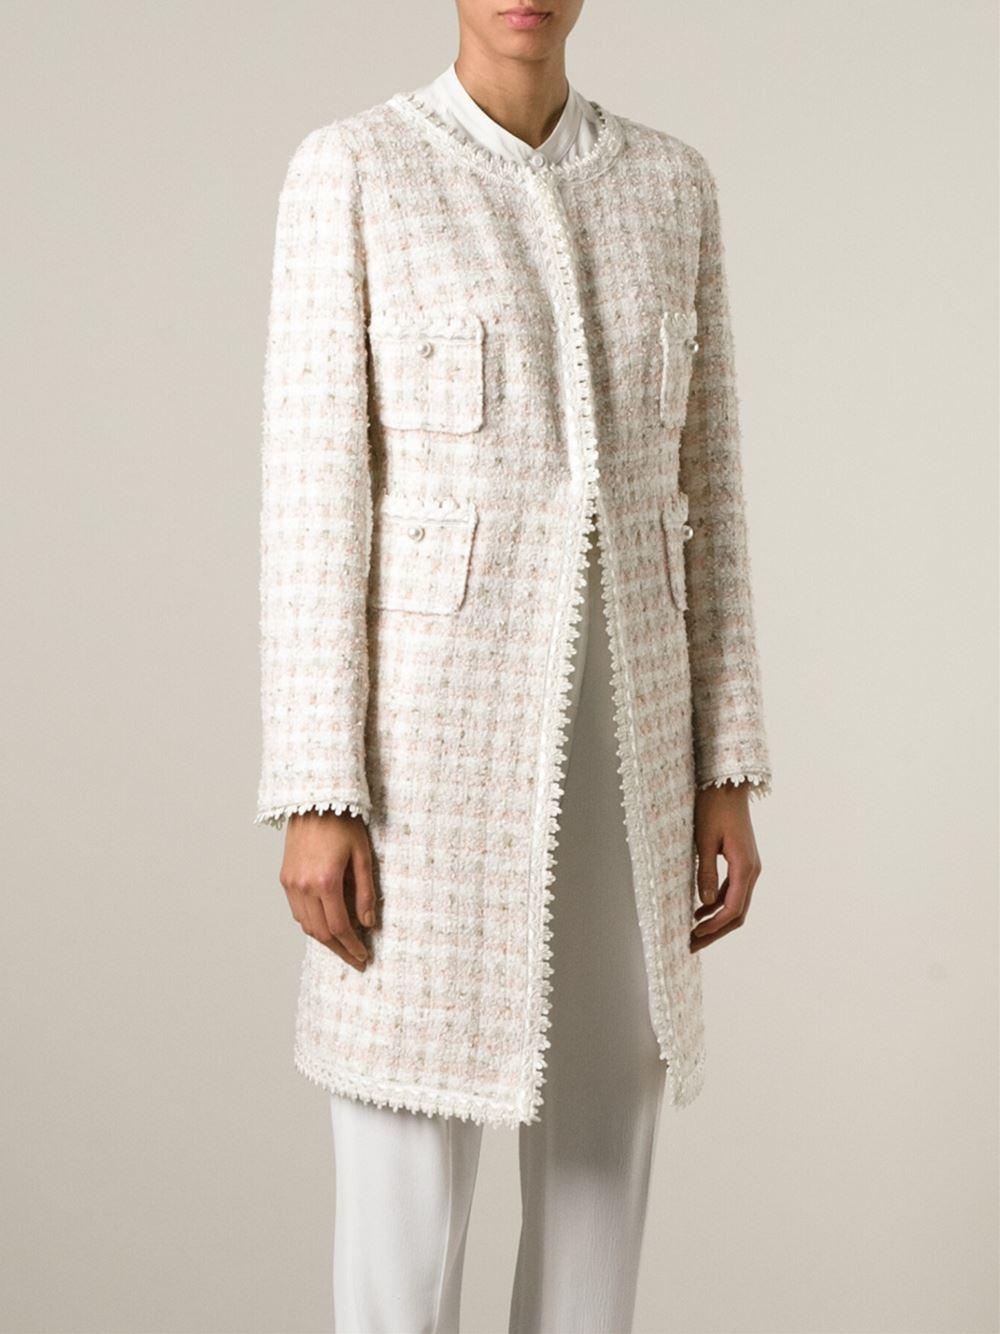 0992e3d6aac94 Lyst - Edward Achour Paris Tweed Pocket Jacket in Natural